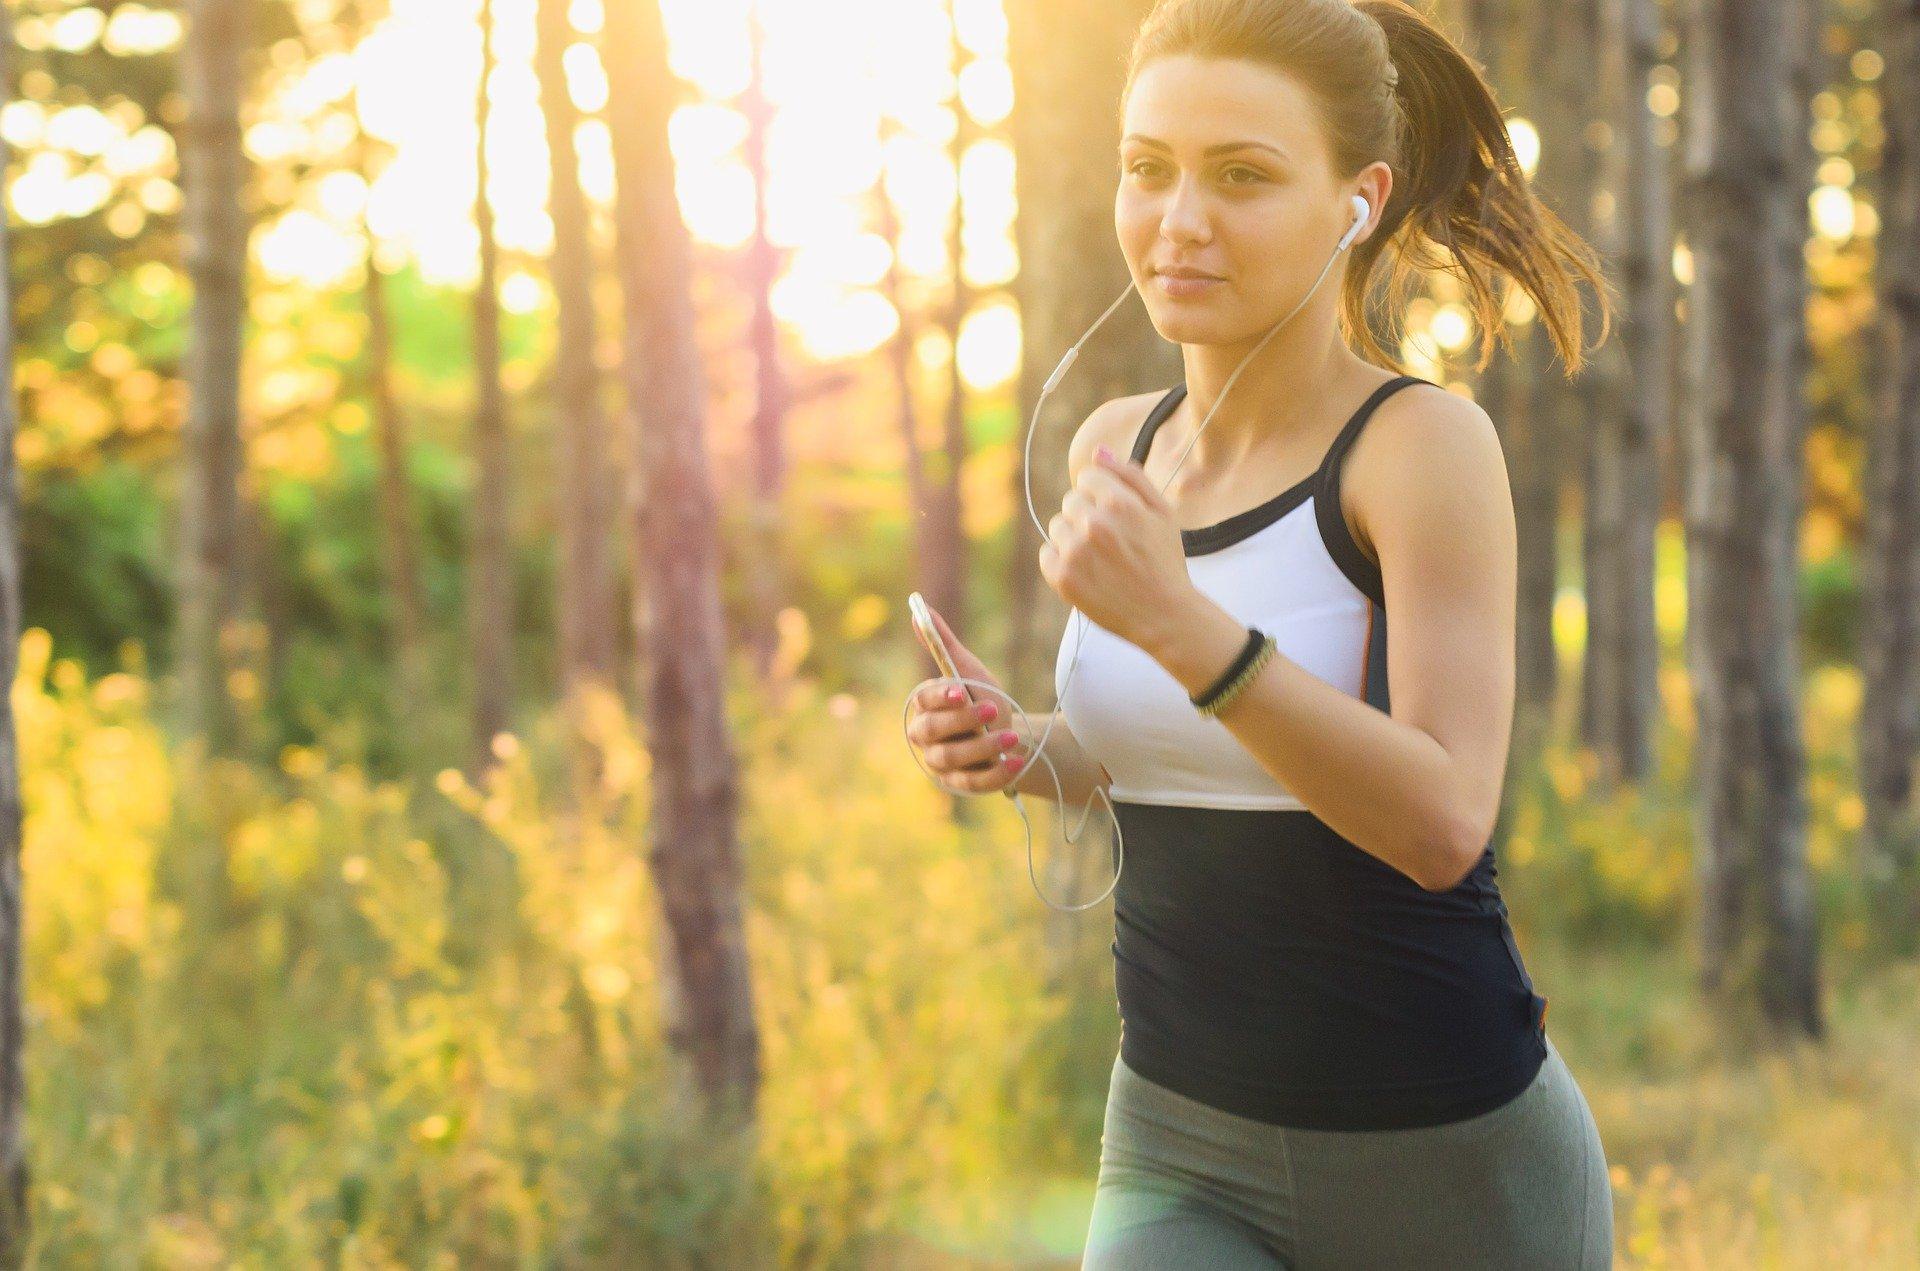 Bauch Fitnessgerät